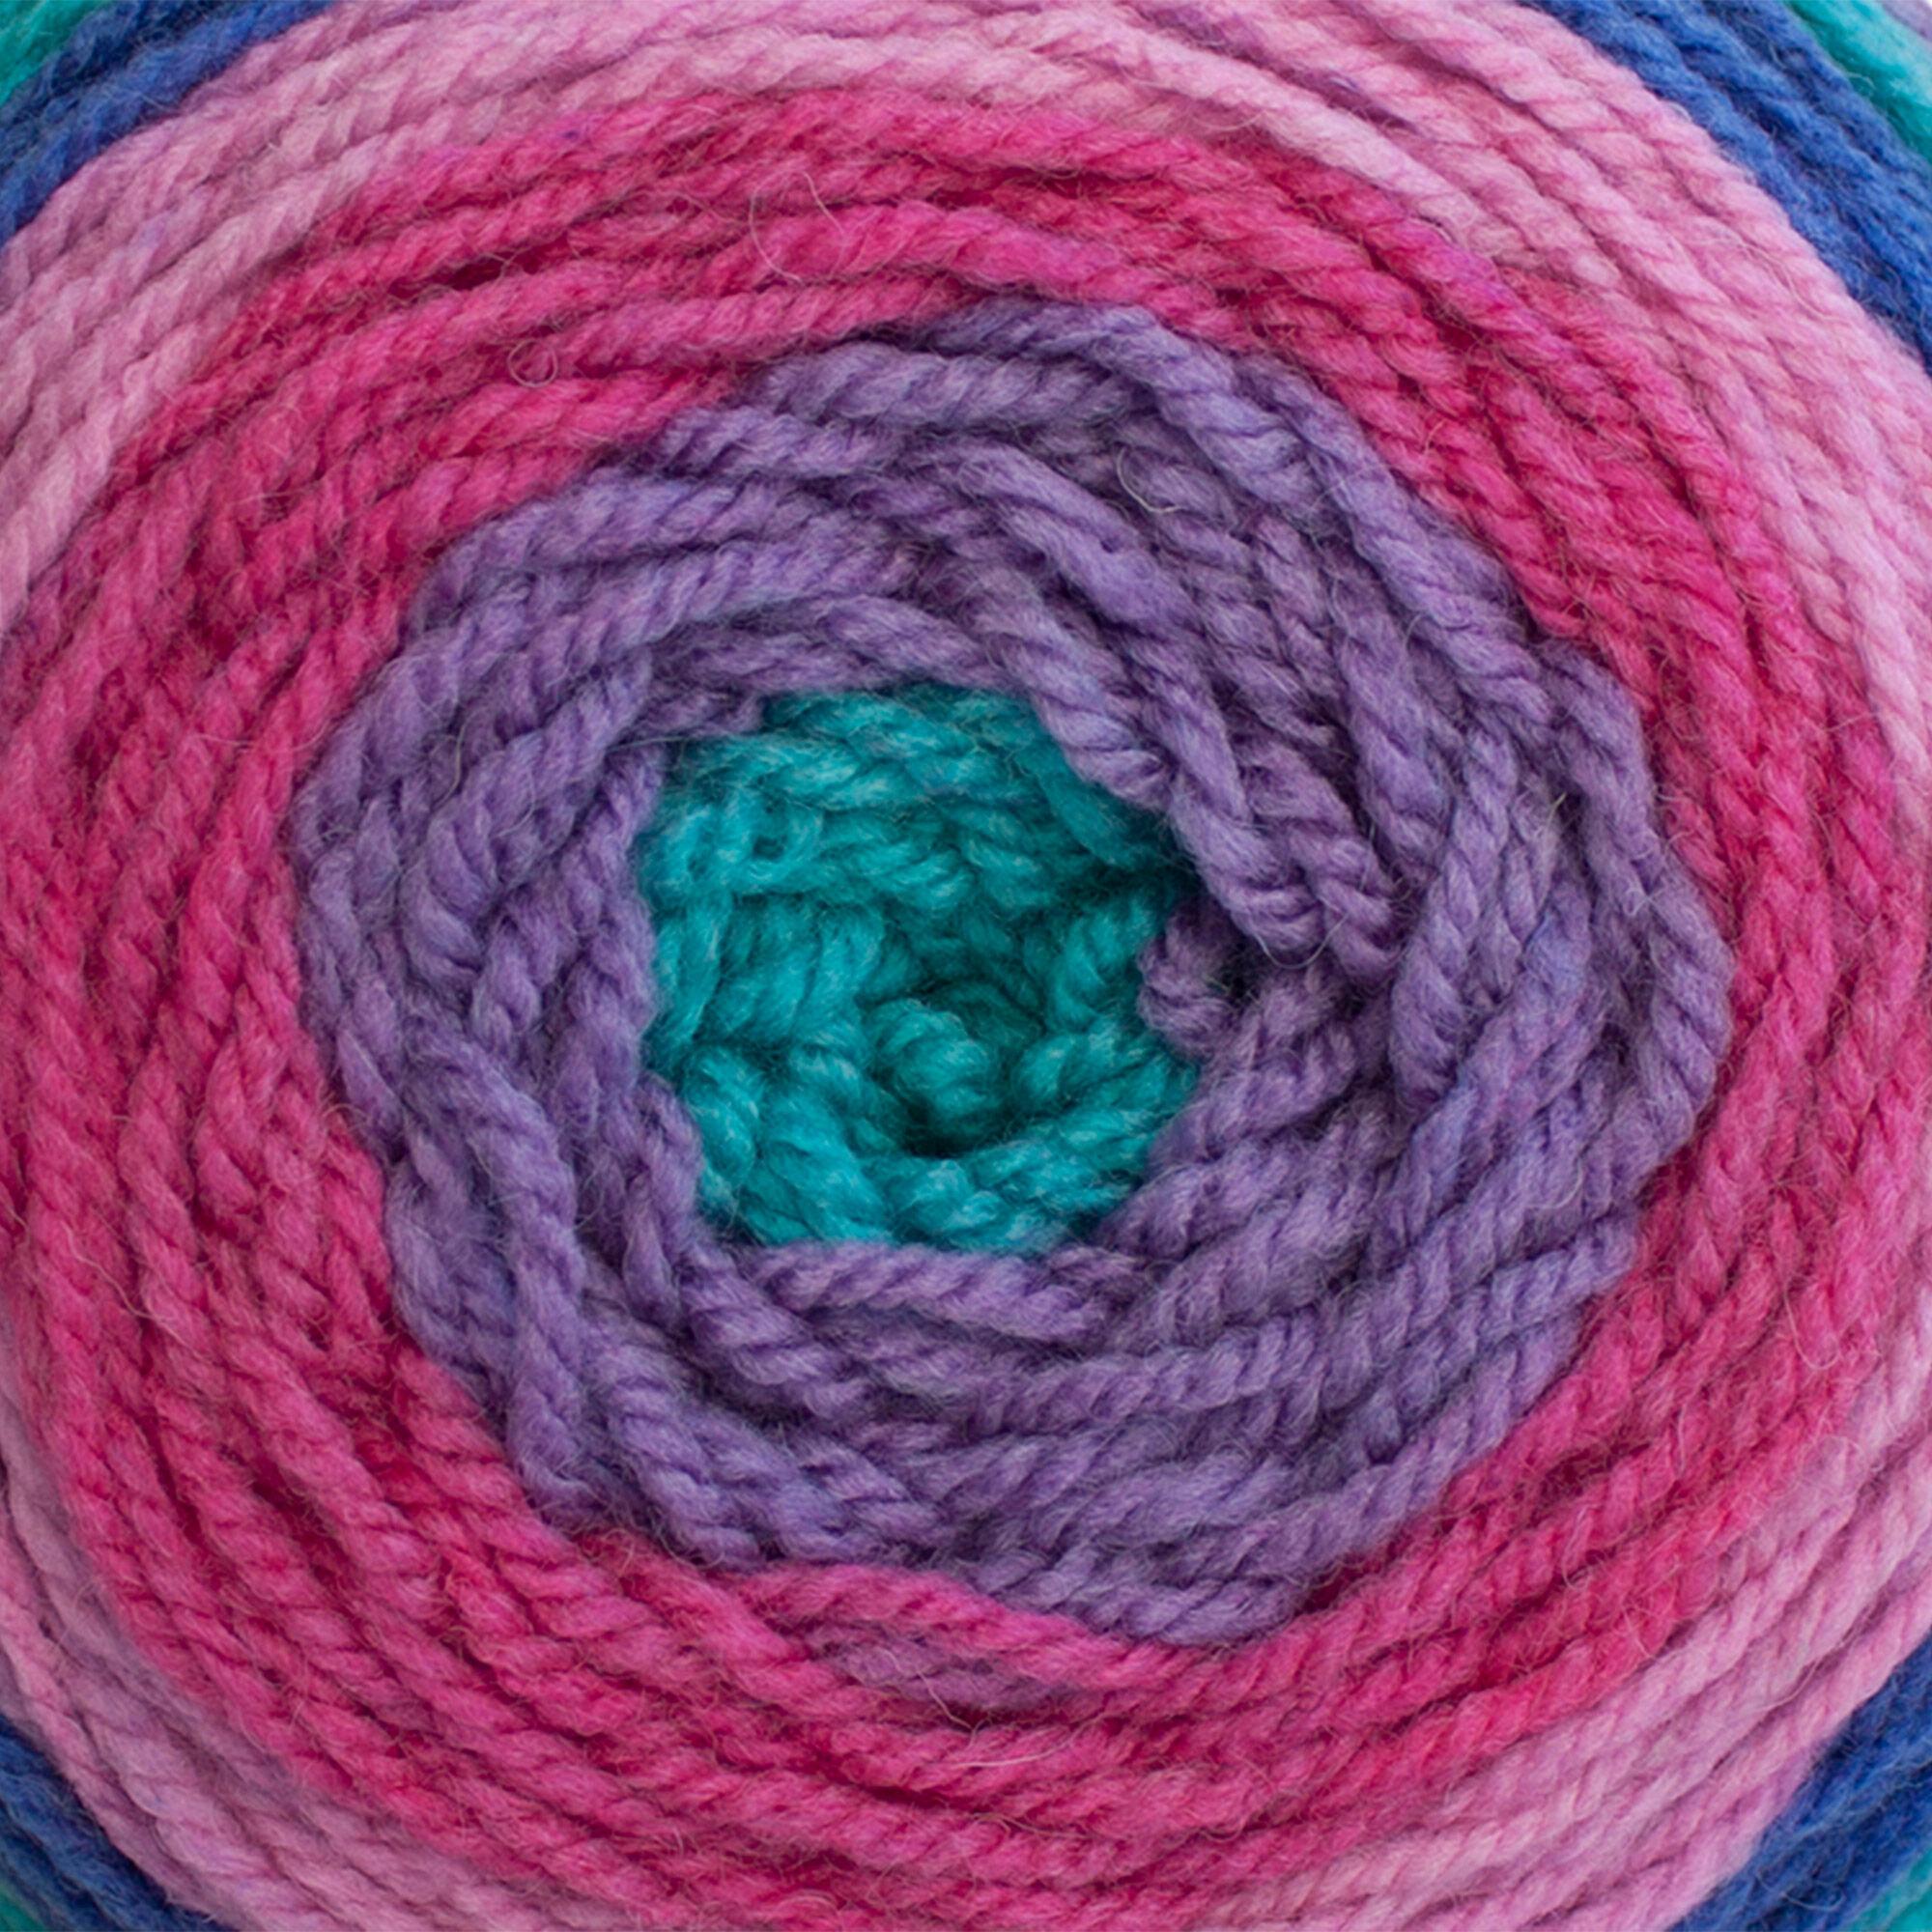 Caron Cakes Yarn, Mixed Berry | Yarnspirations